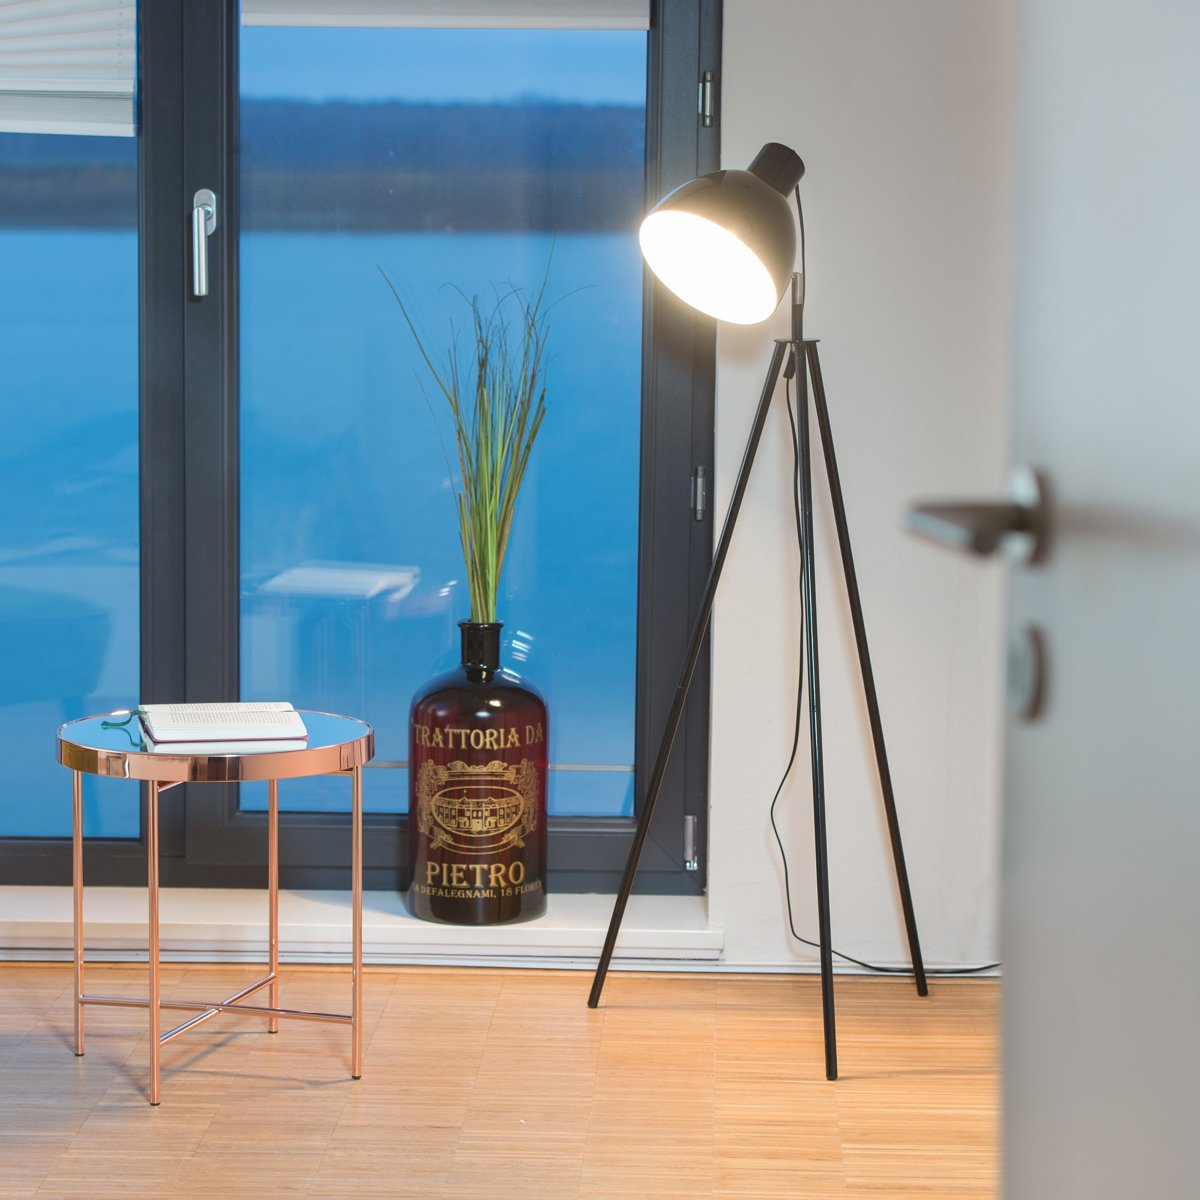 bol.com | relaxdays Staande lamp tripod - vloerlamp - woonkamer ...